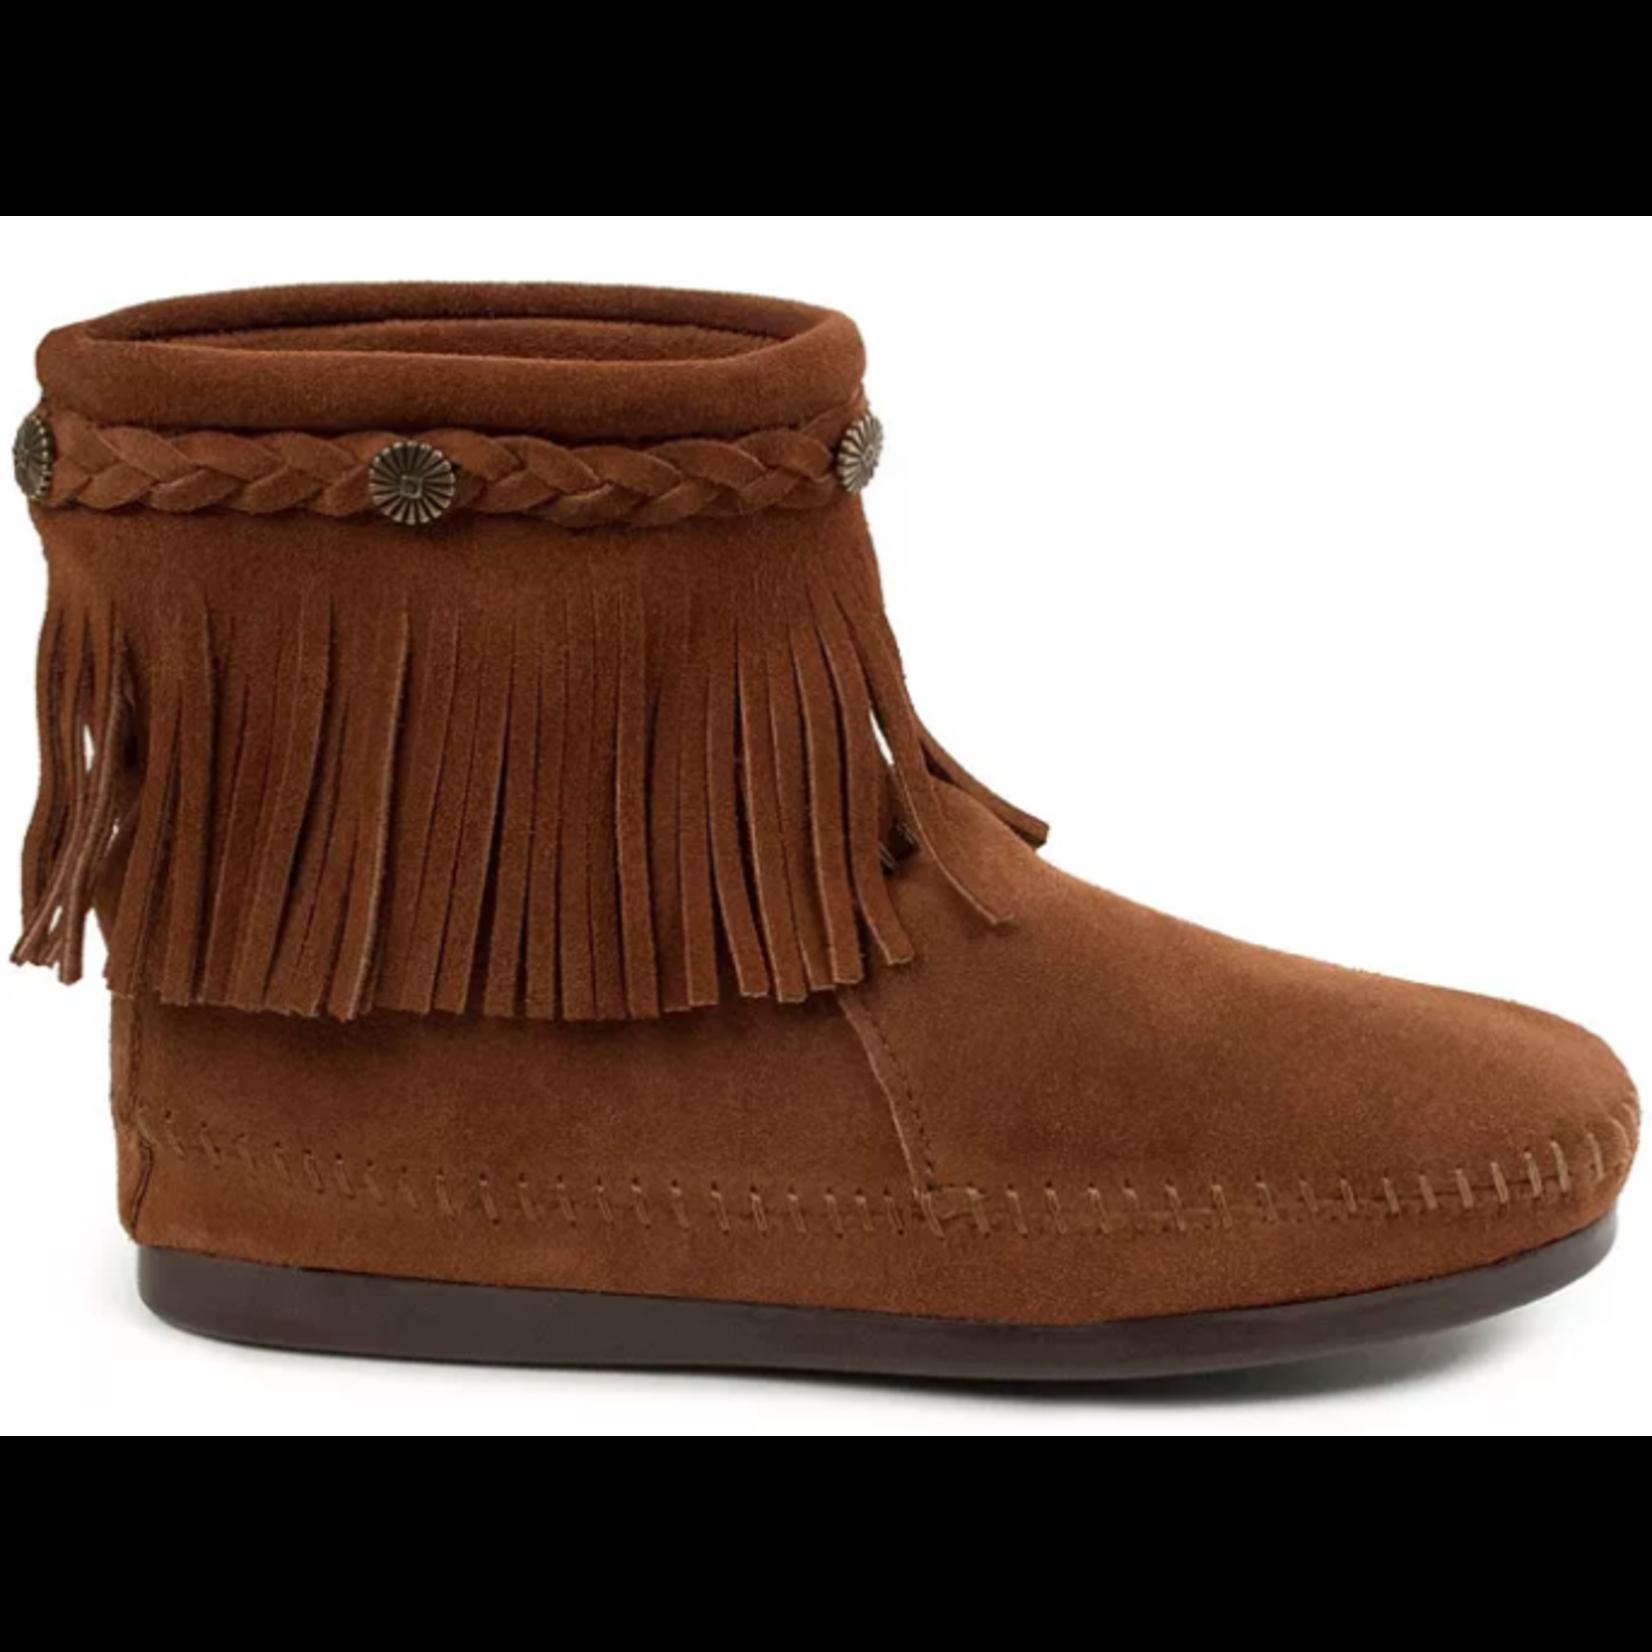 Minnetonka Women's Minnetonka High Top Back zip Boot Brown 292